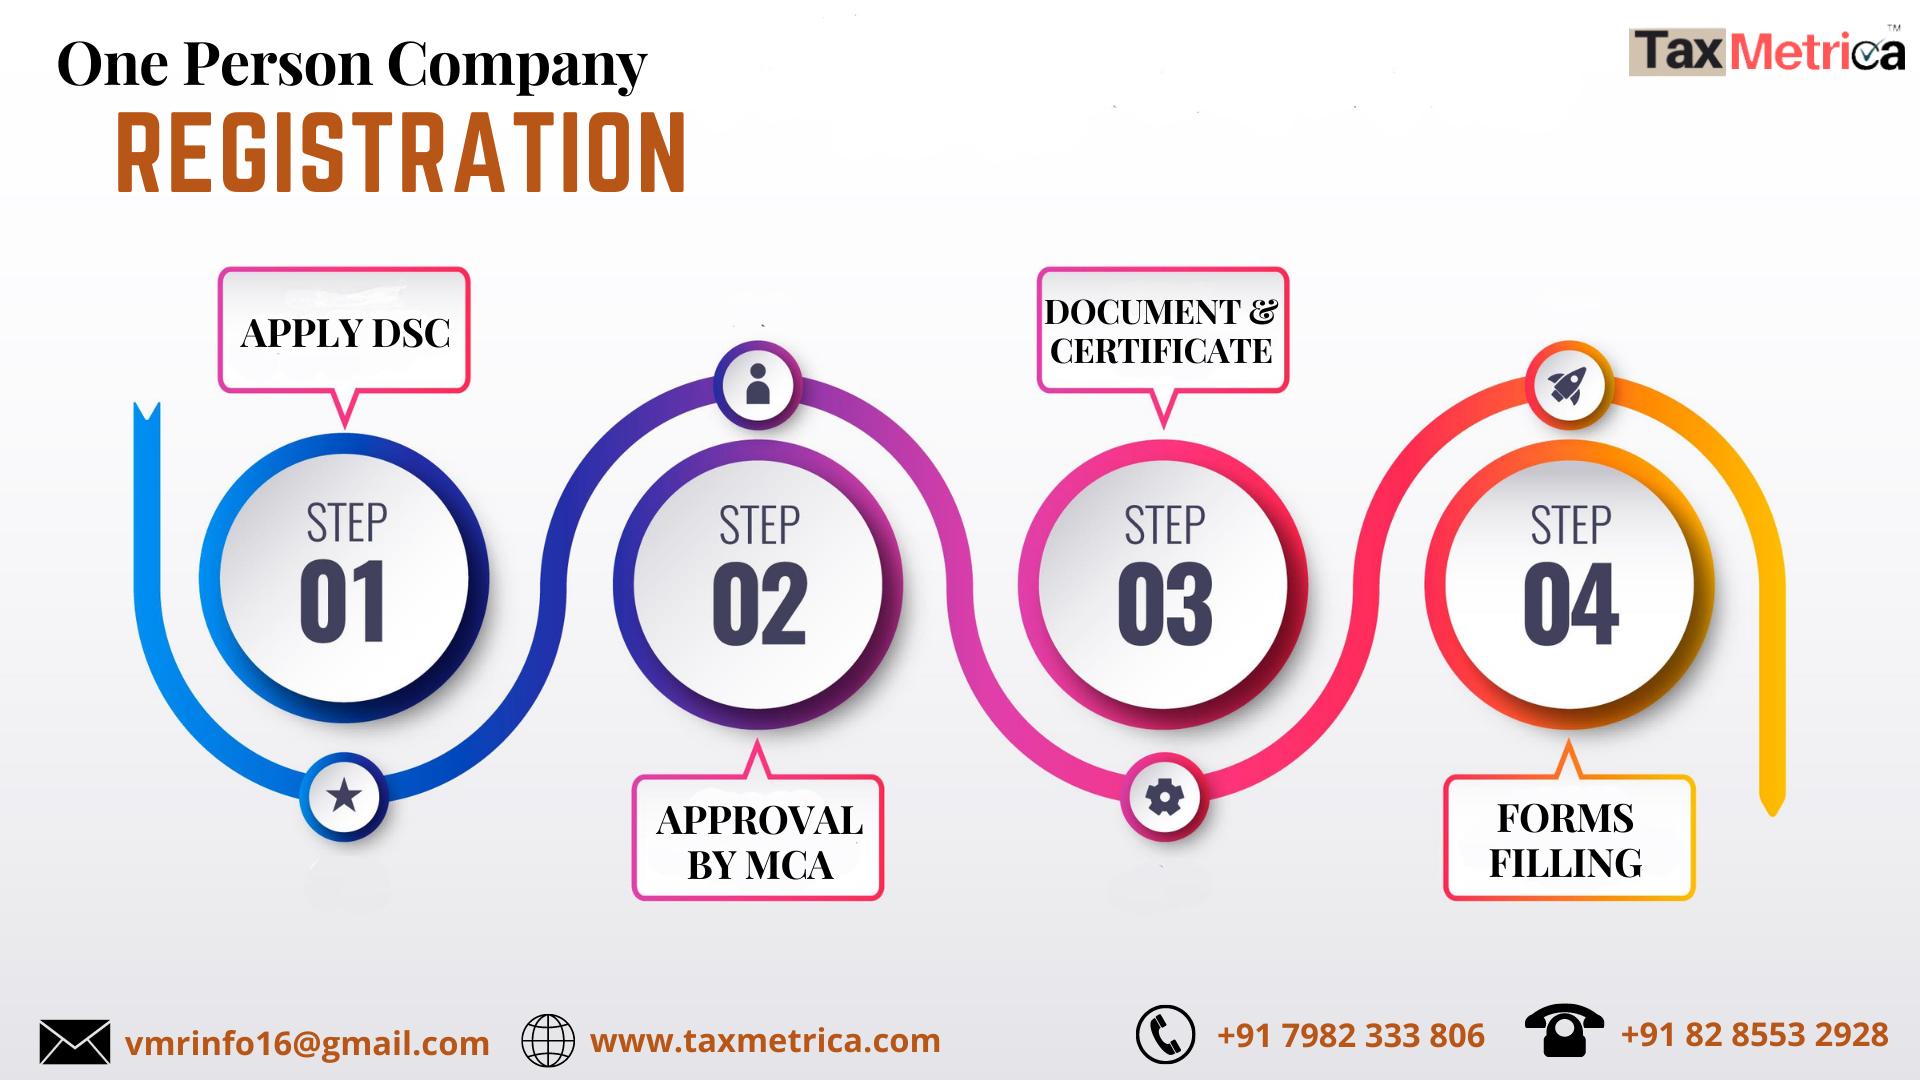 OPC Registration Process